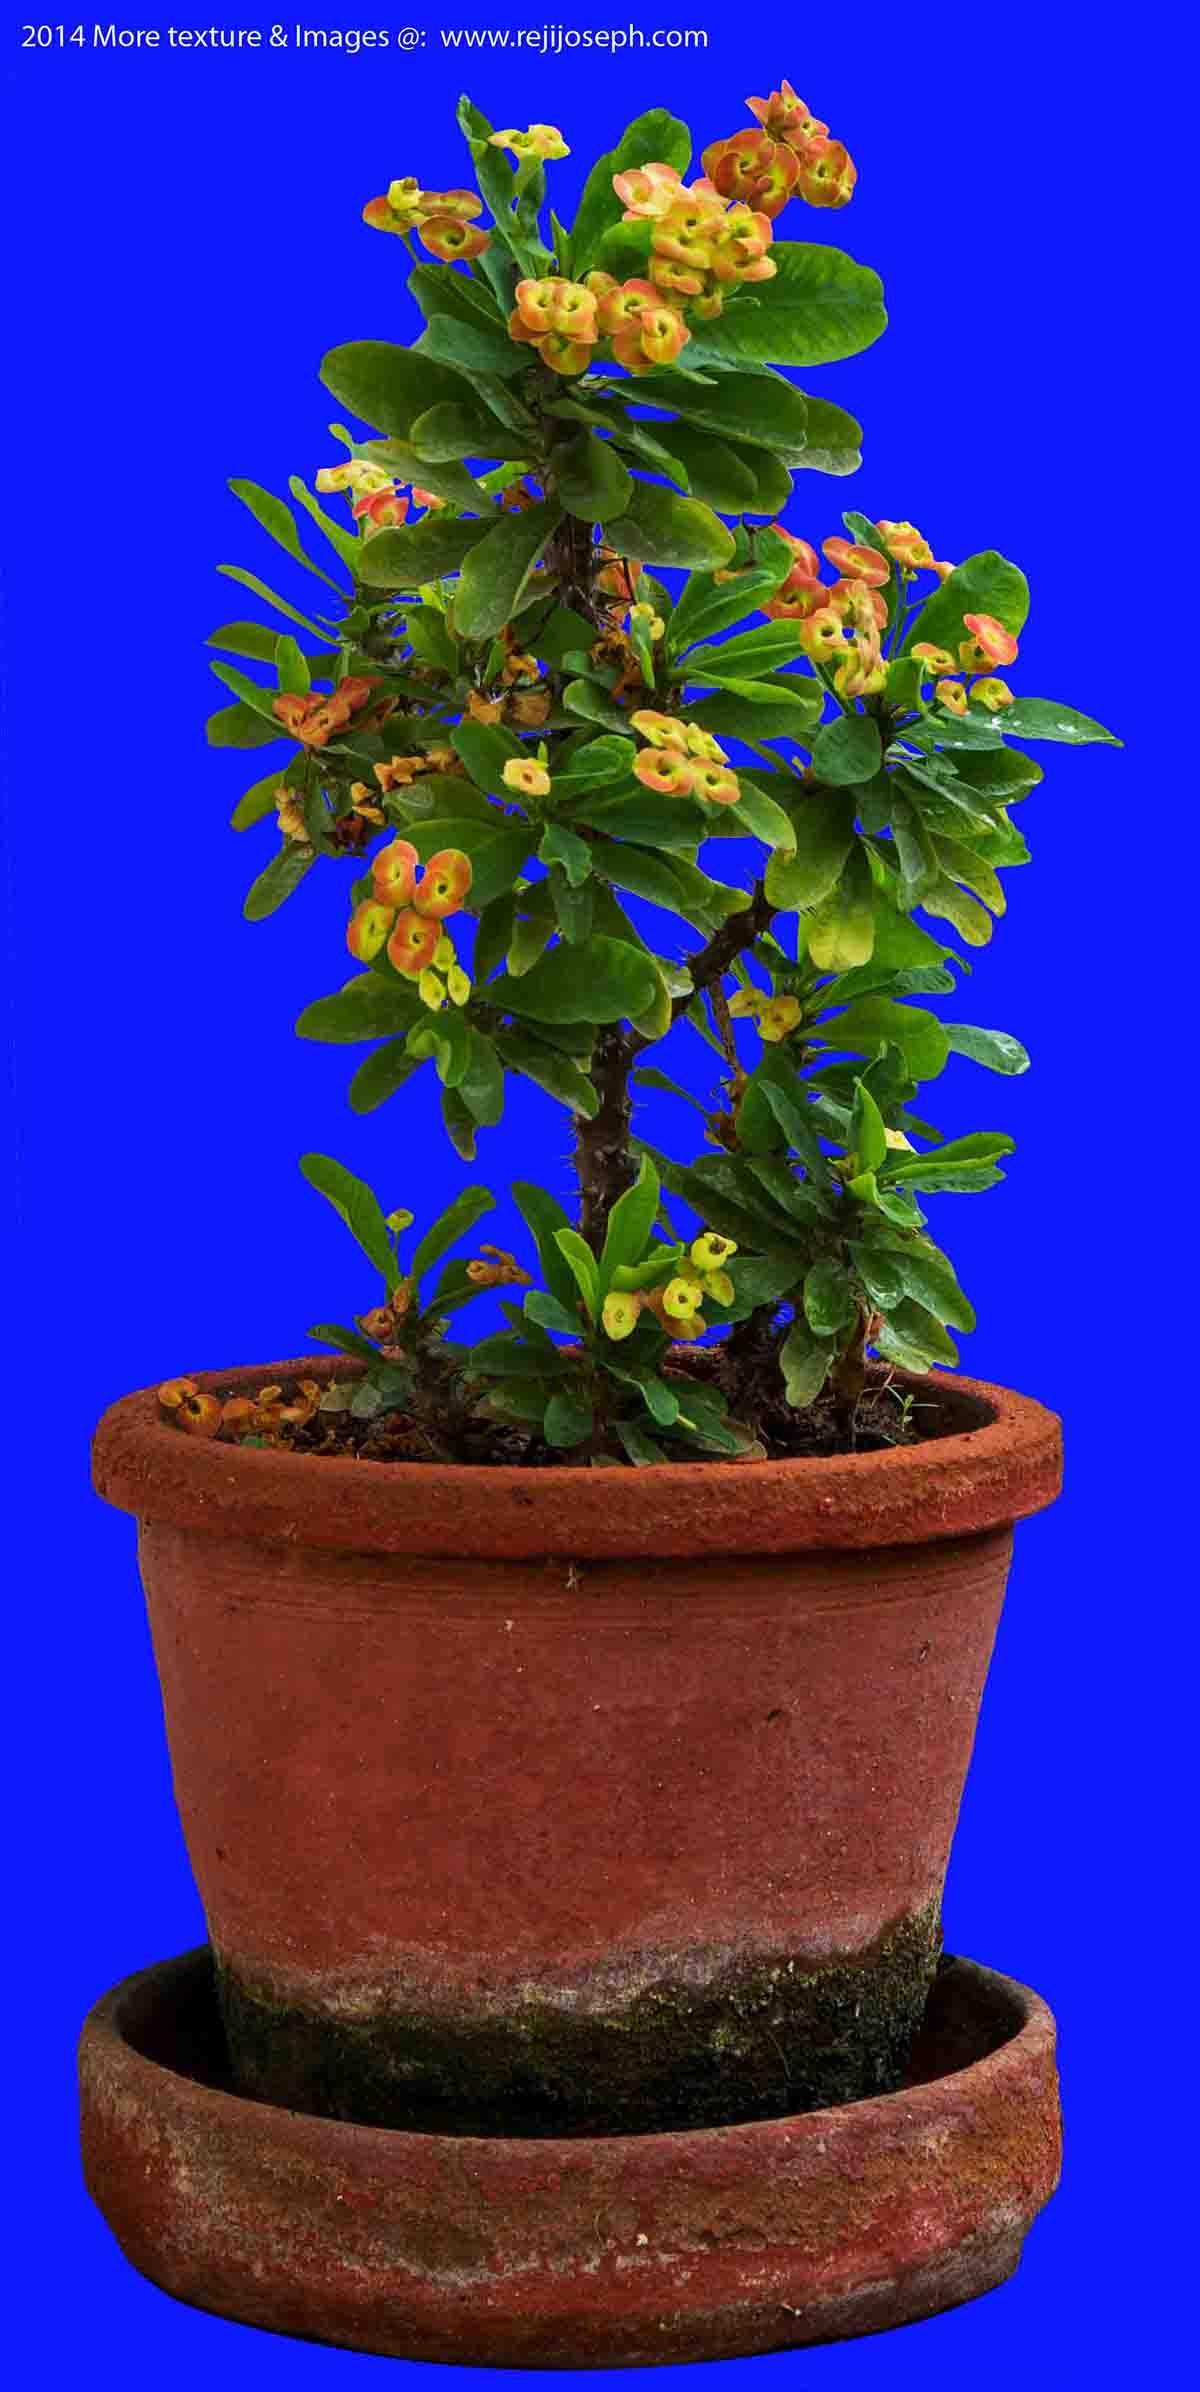 Euphorbia Milii garden plant 00001